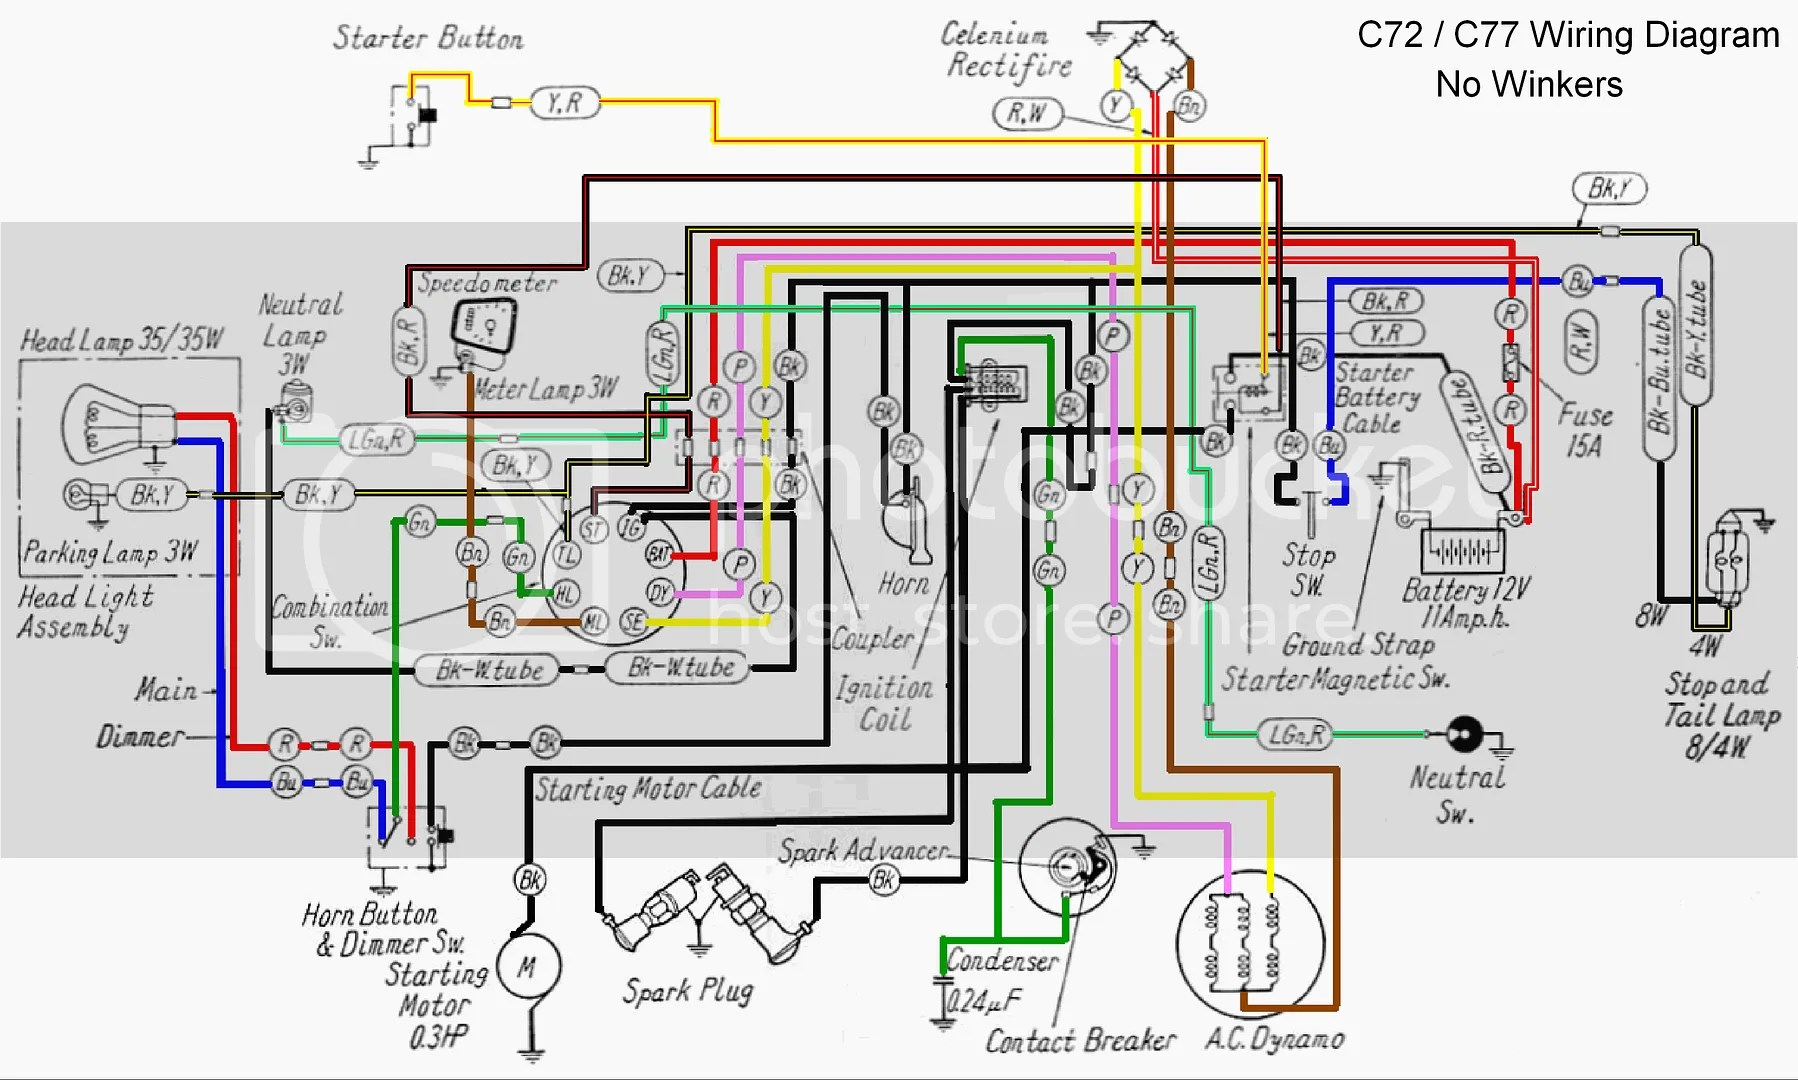 hight resolution of honda dream wiring diagram wiring diagram yer1966 honda dream wiring diagram wiring diagram gol honda dream